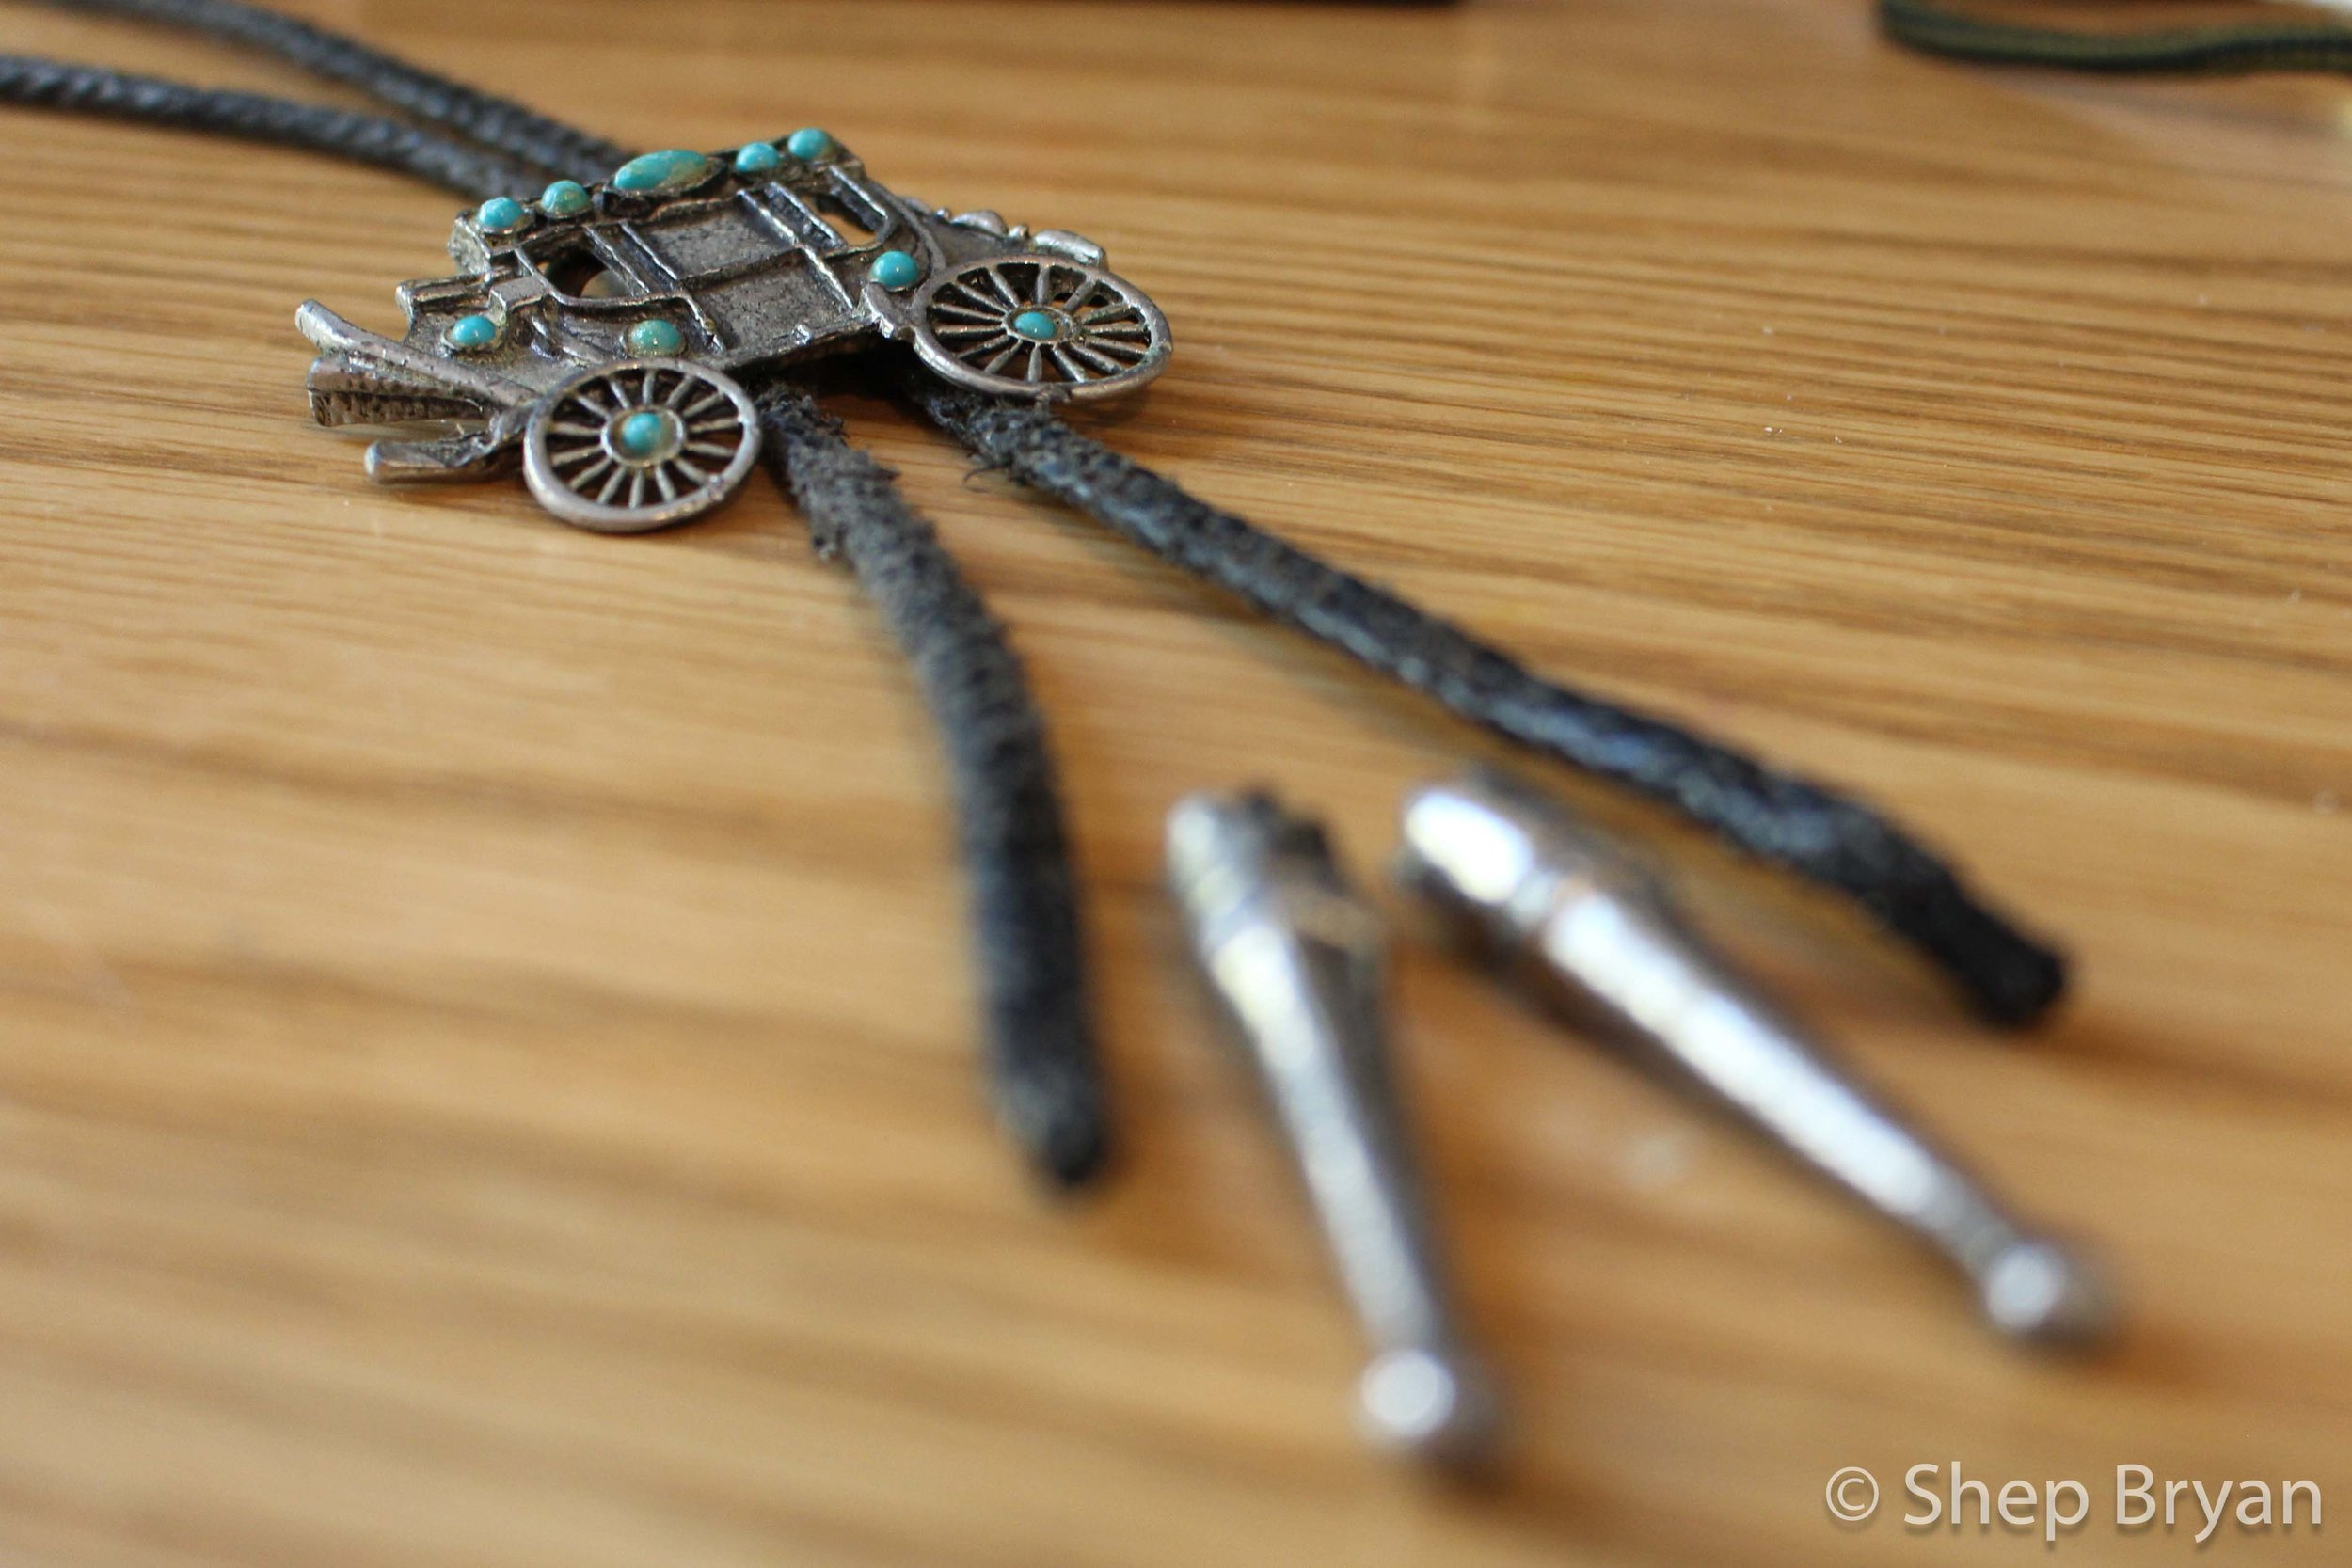 The vintage silver medallion & fraying vinyl cord.